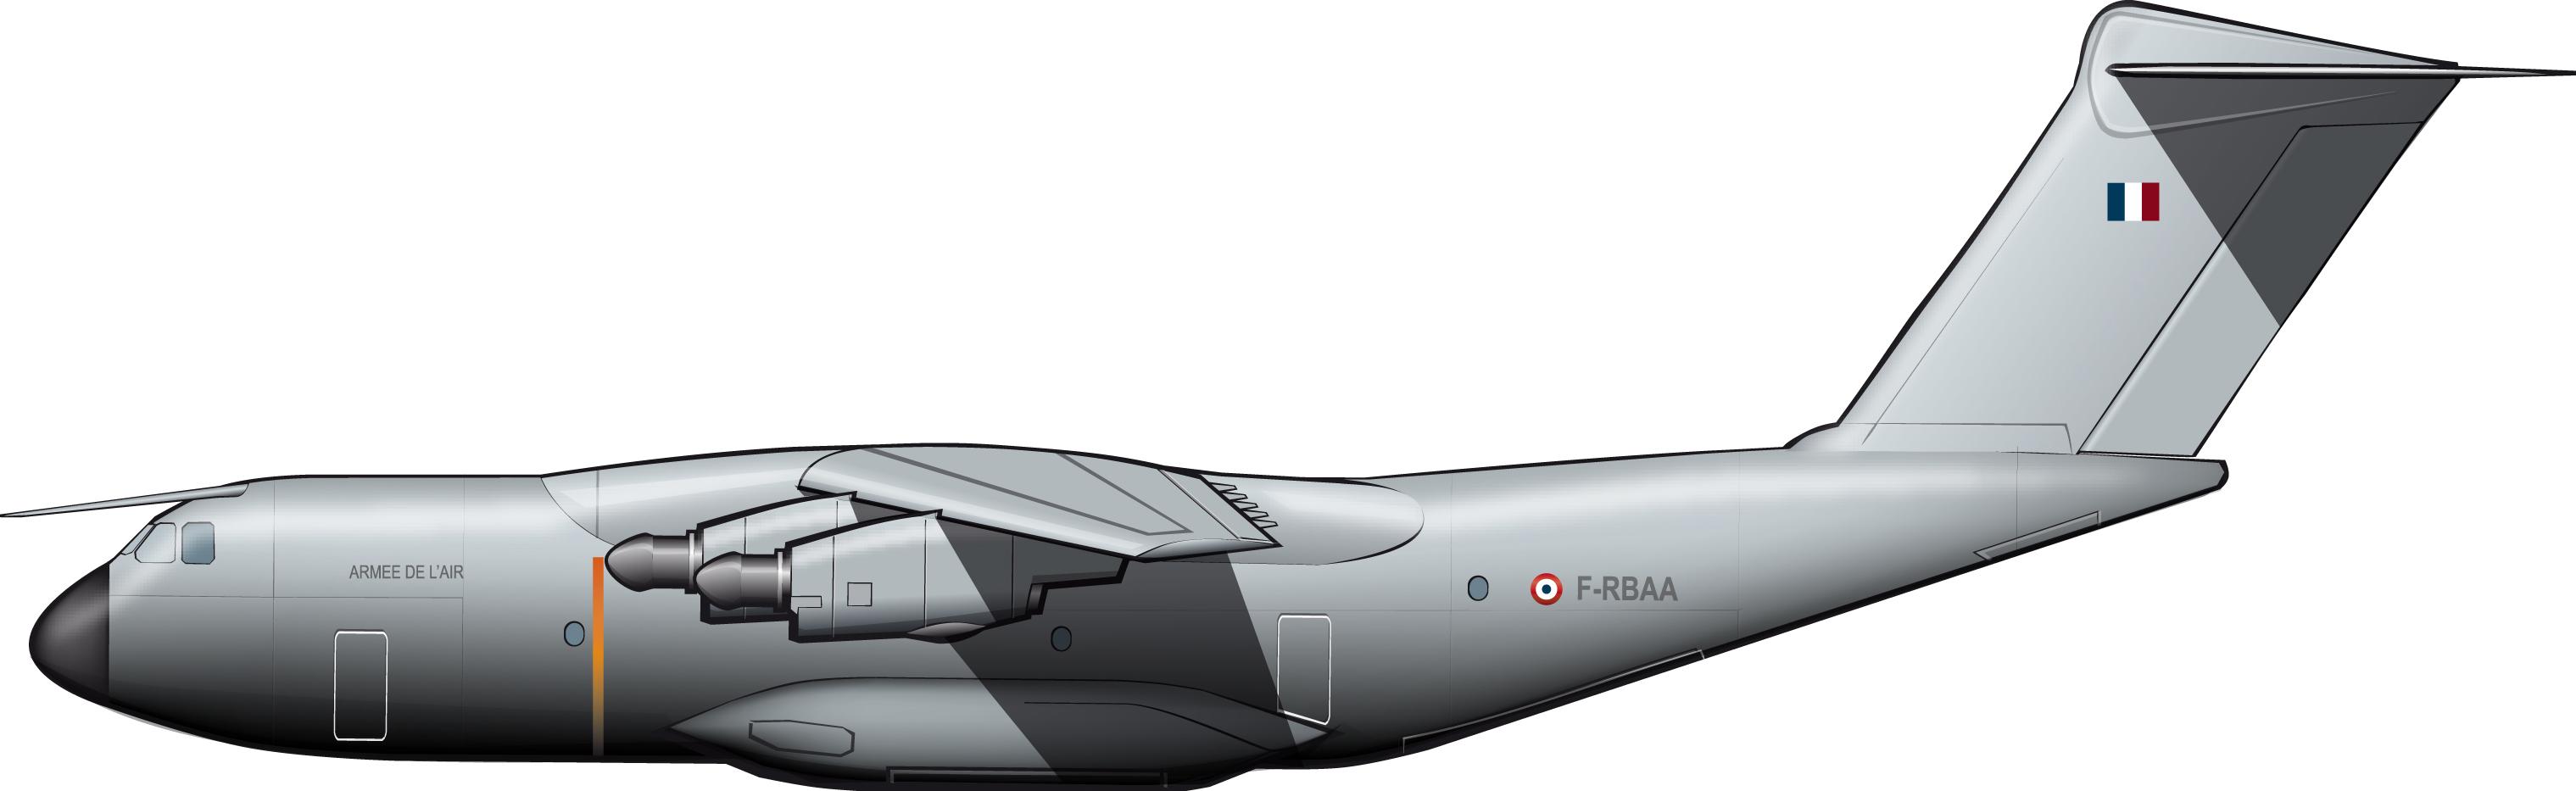 airbusa400Mspainotro